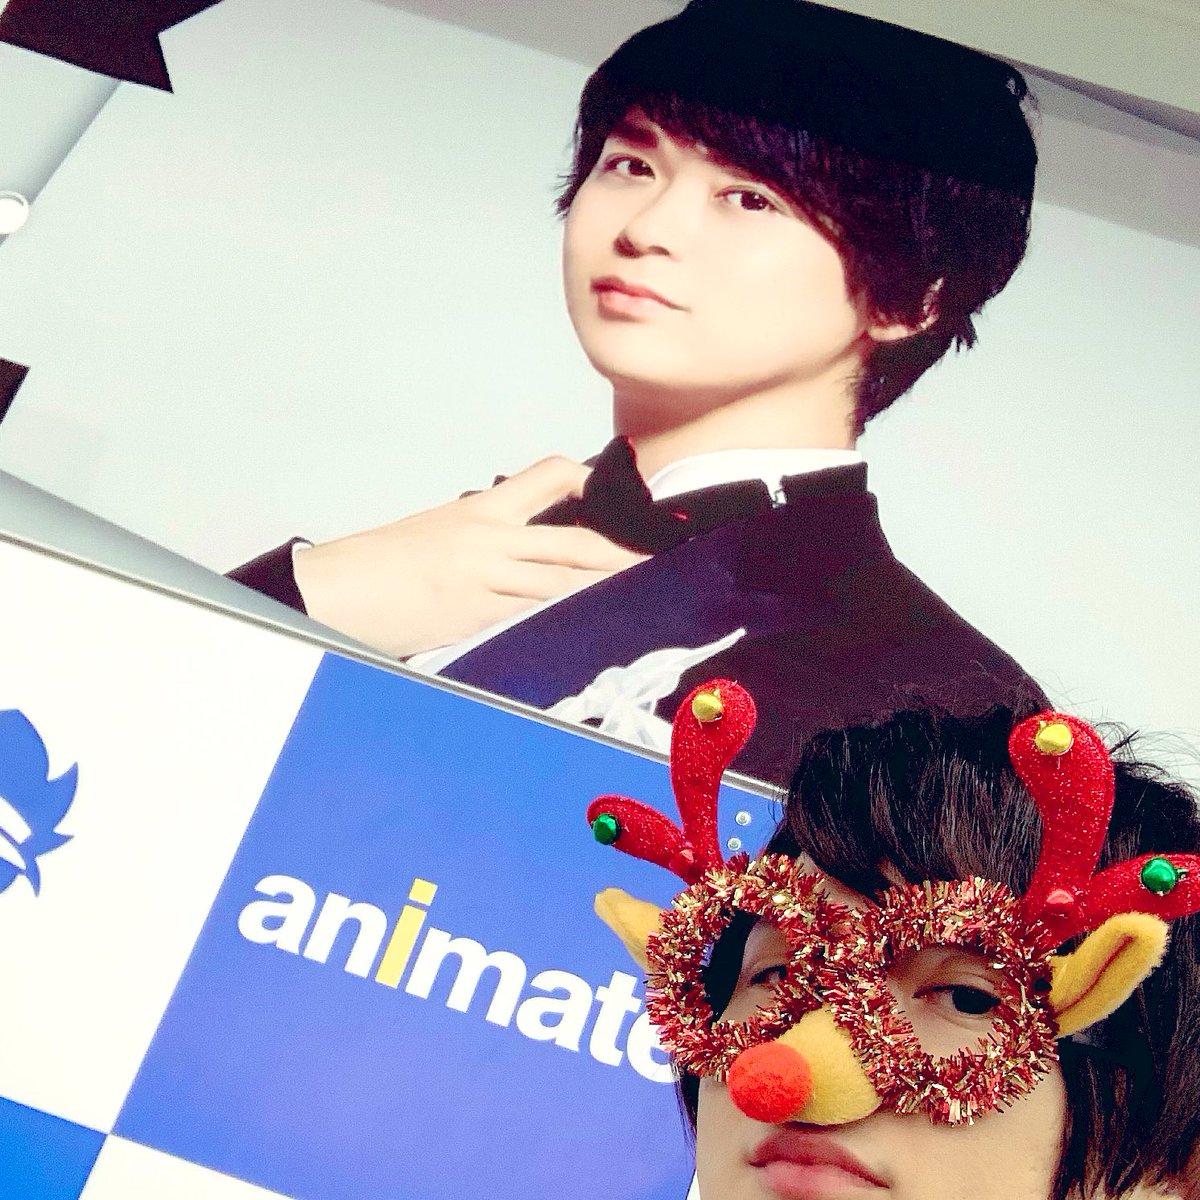 Party Jackerリリースイベント✨ご来場ありがとうございました(^^)まさかやる事になるとは…でも改めて、皆様の暖かさを、色々…感じました(^^)